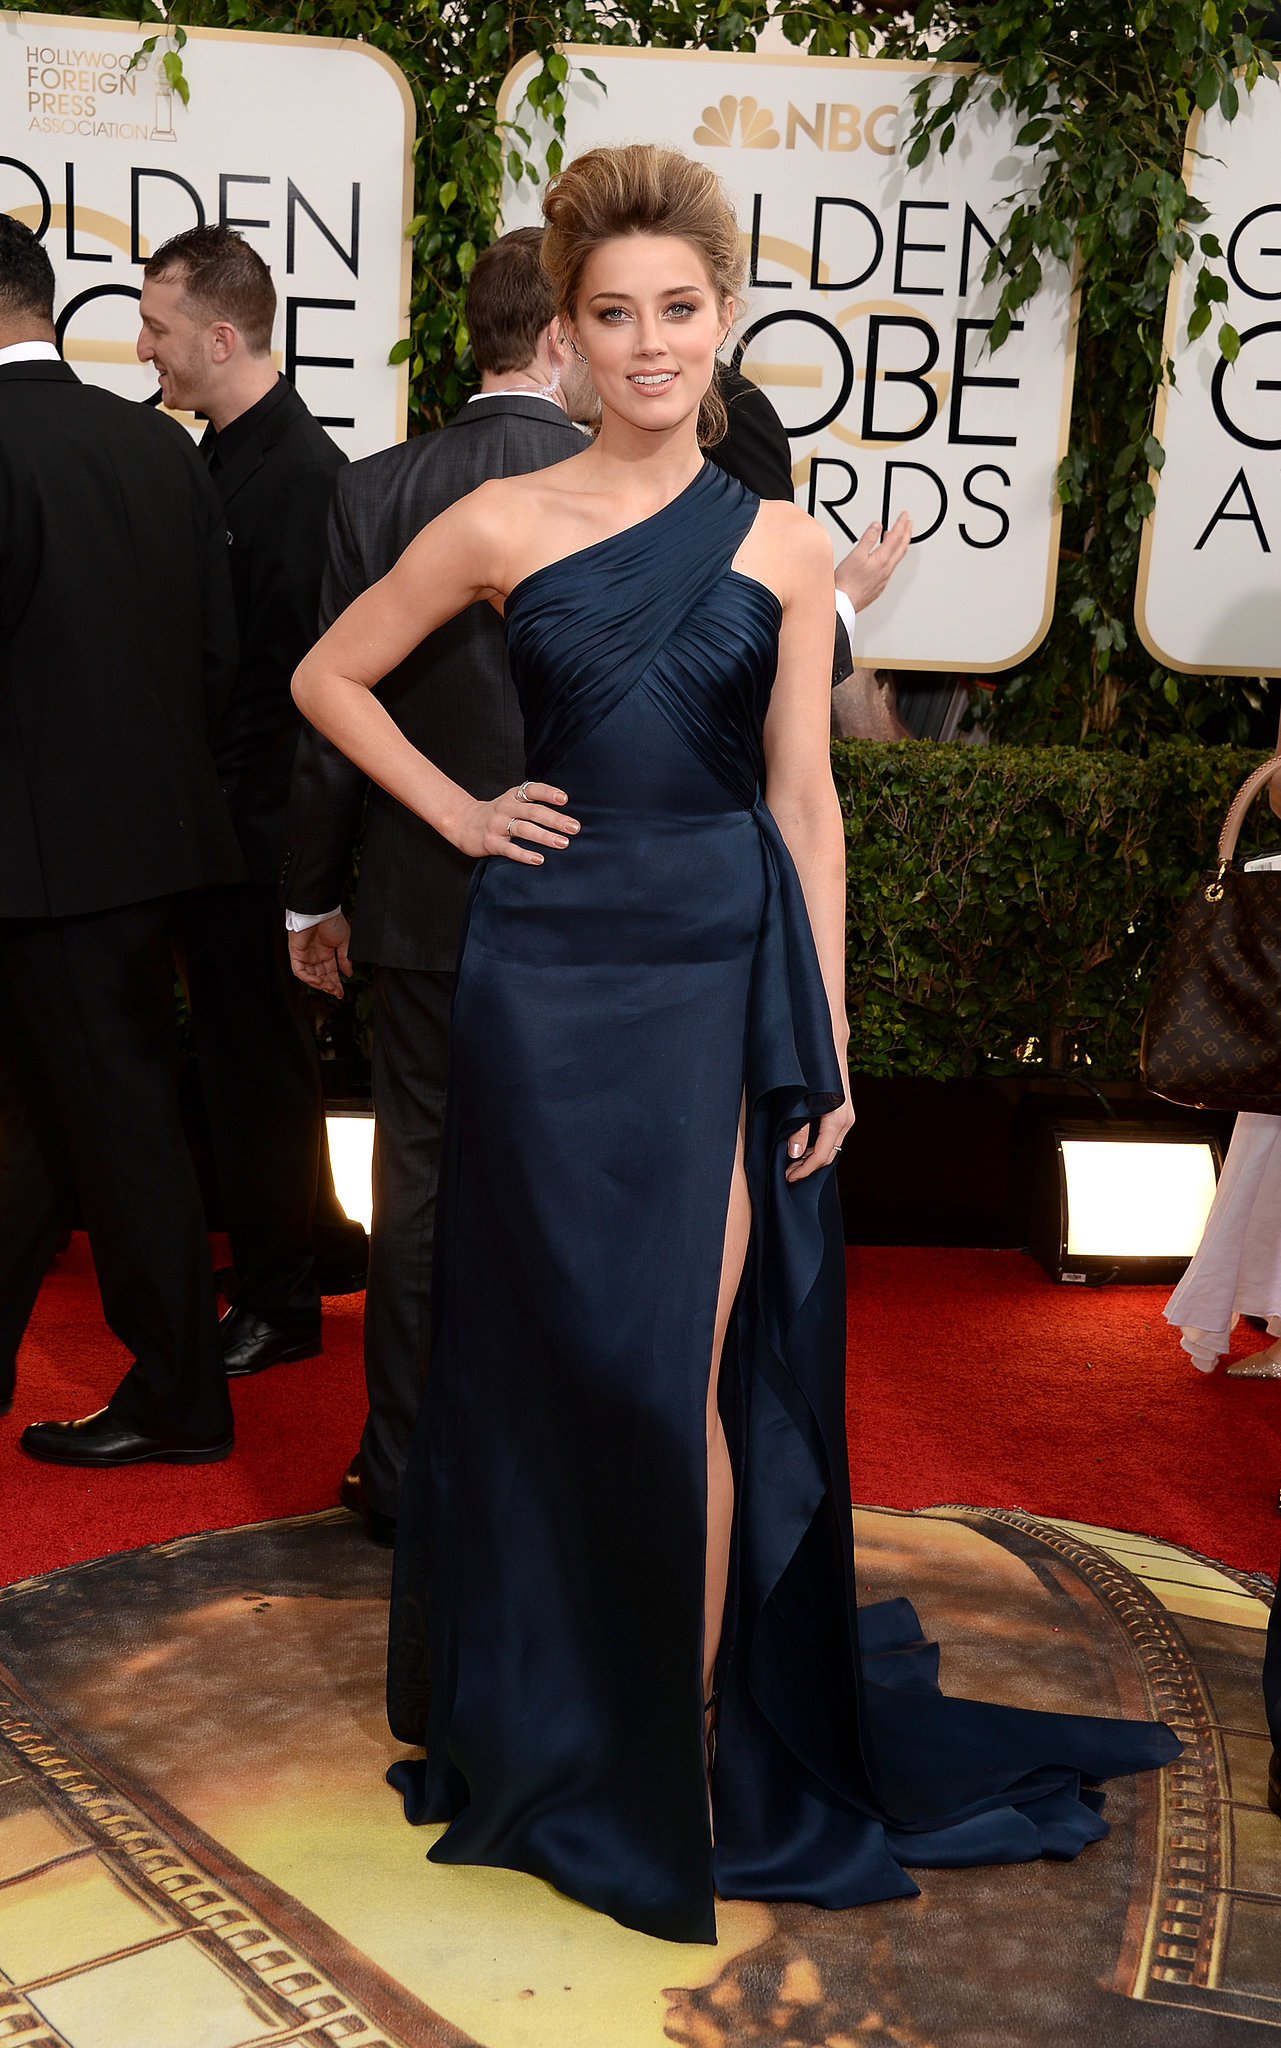 Amber Heard in Atelier Versace